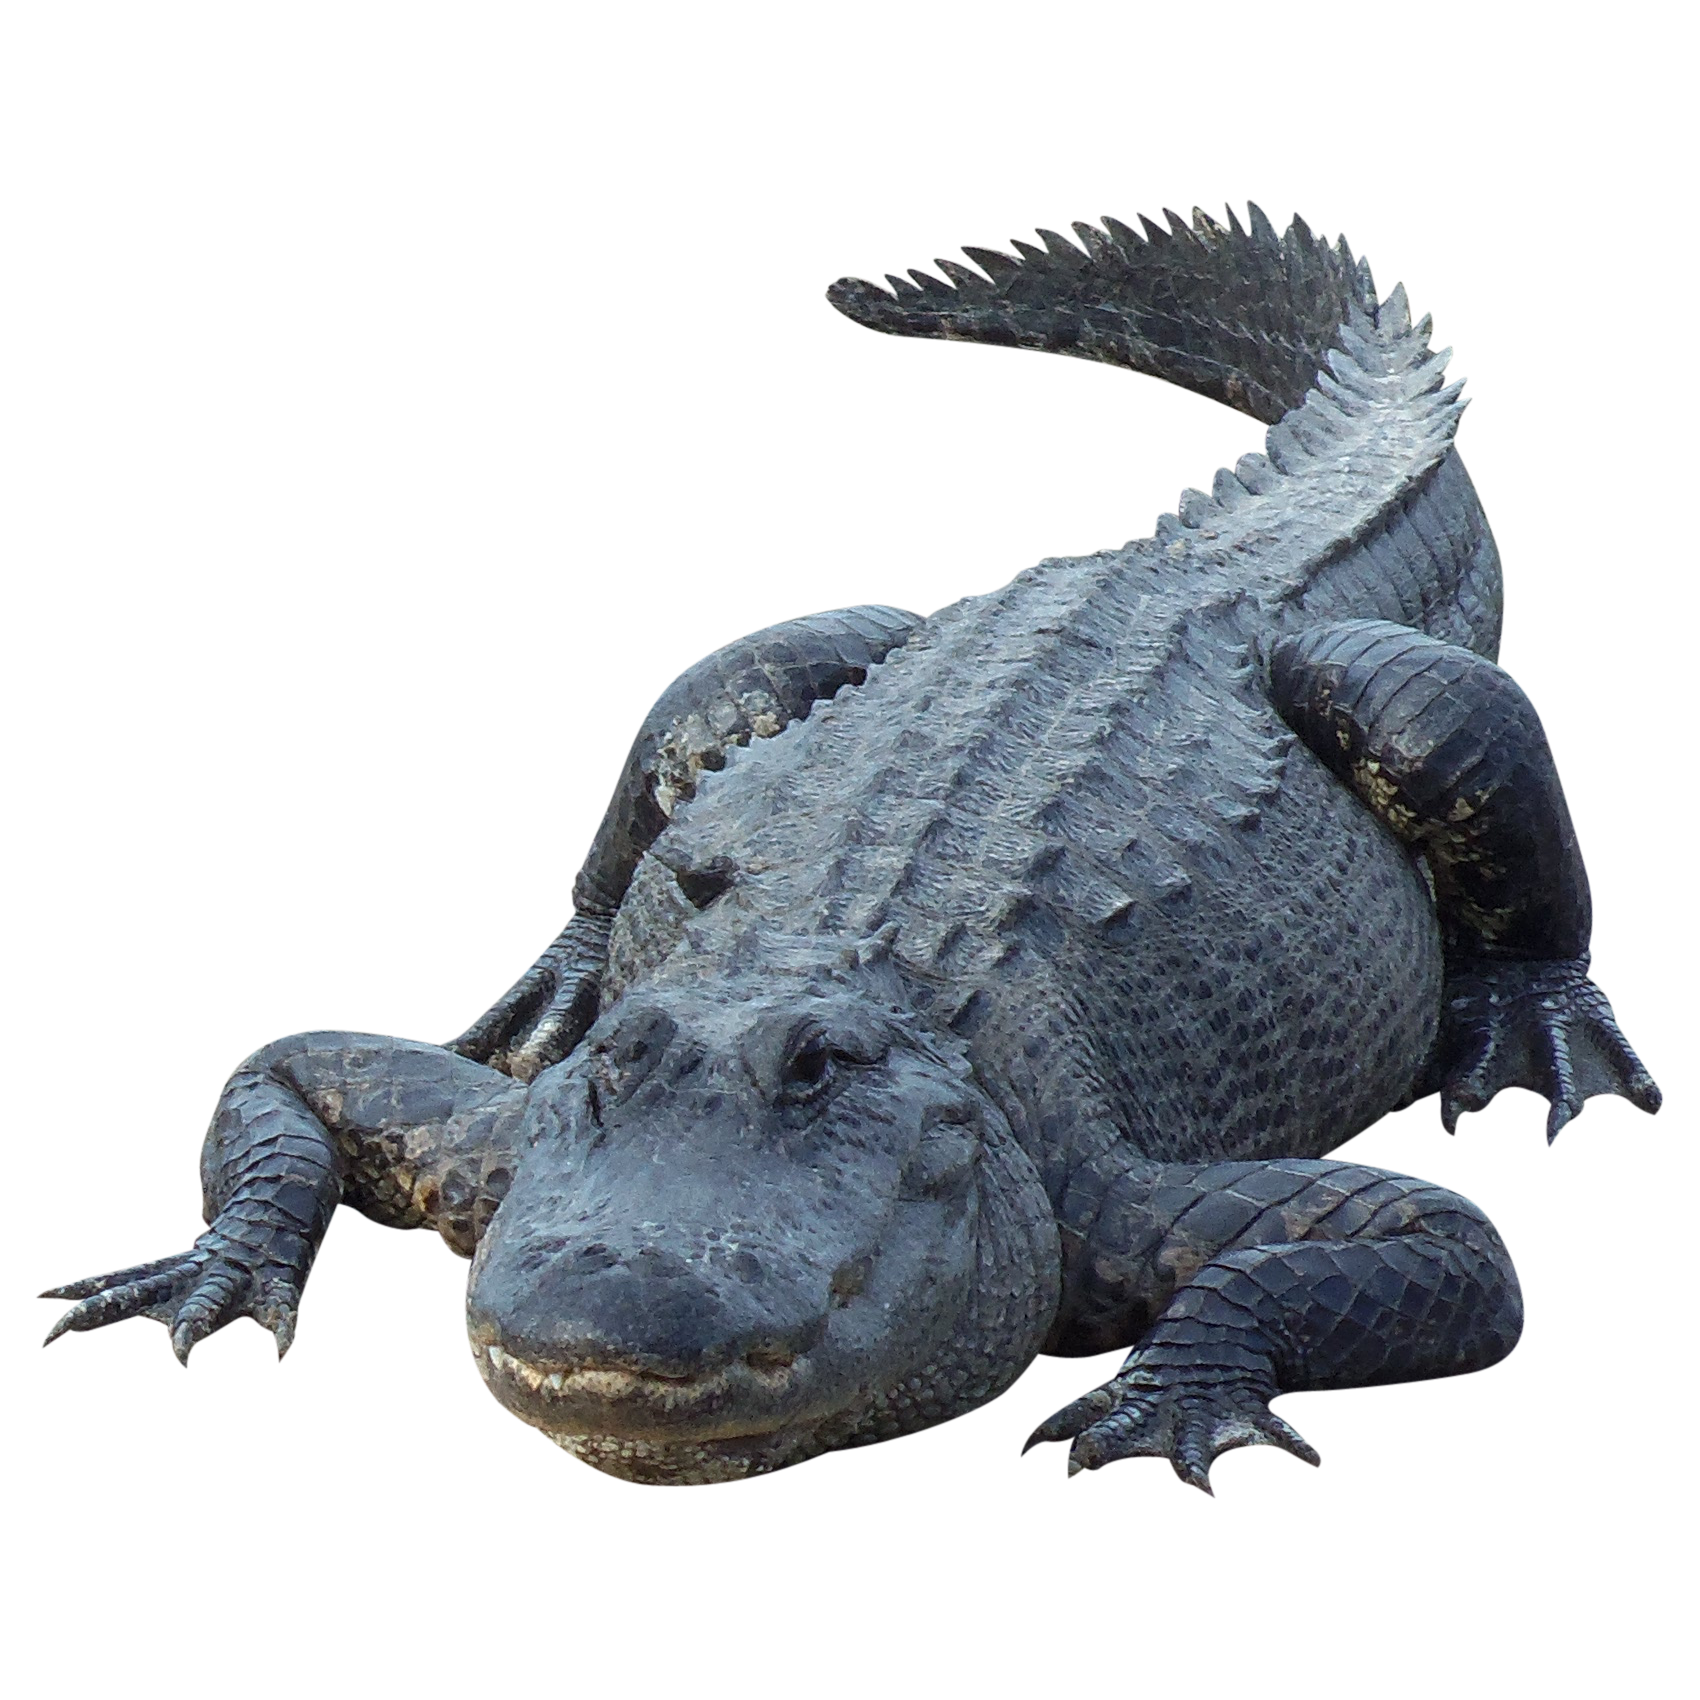 Gator 03 1 700 1 700 Pixelimmediateentourage